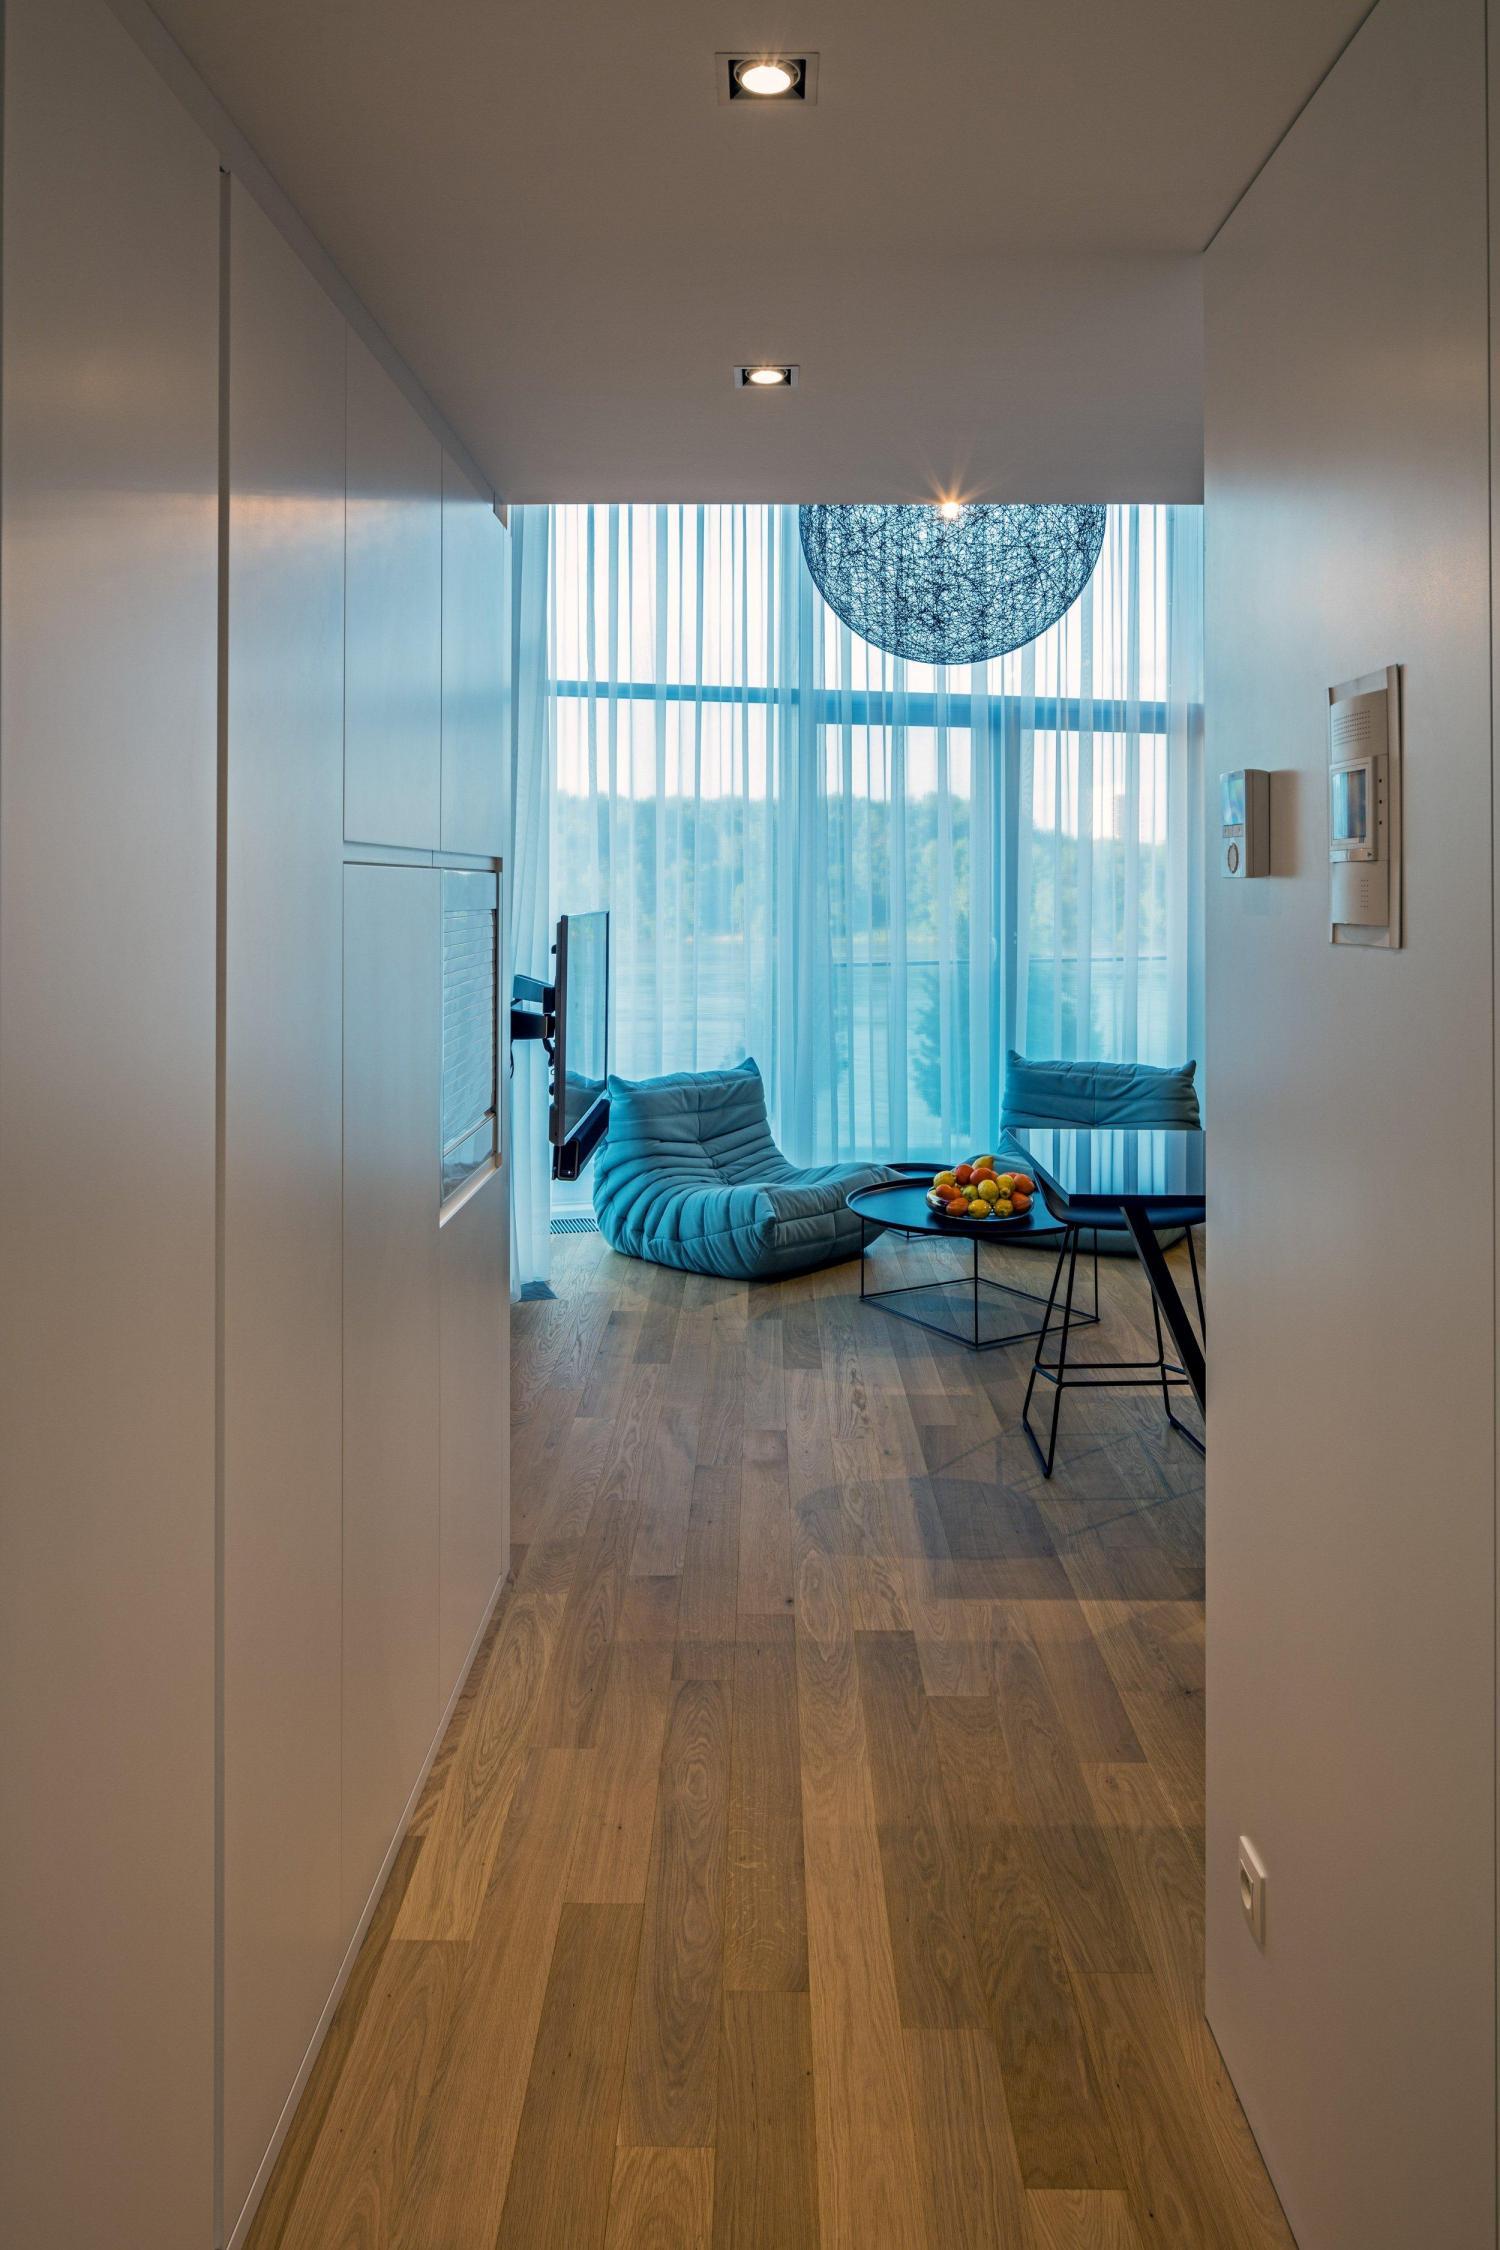 mini maisonette wohnung eurovea bratislava slowakei. Black Bedroom Furniture Sets. Home Design Ideas